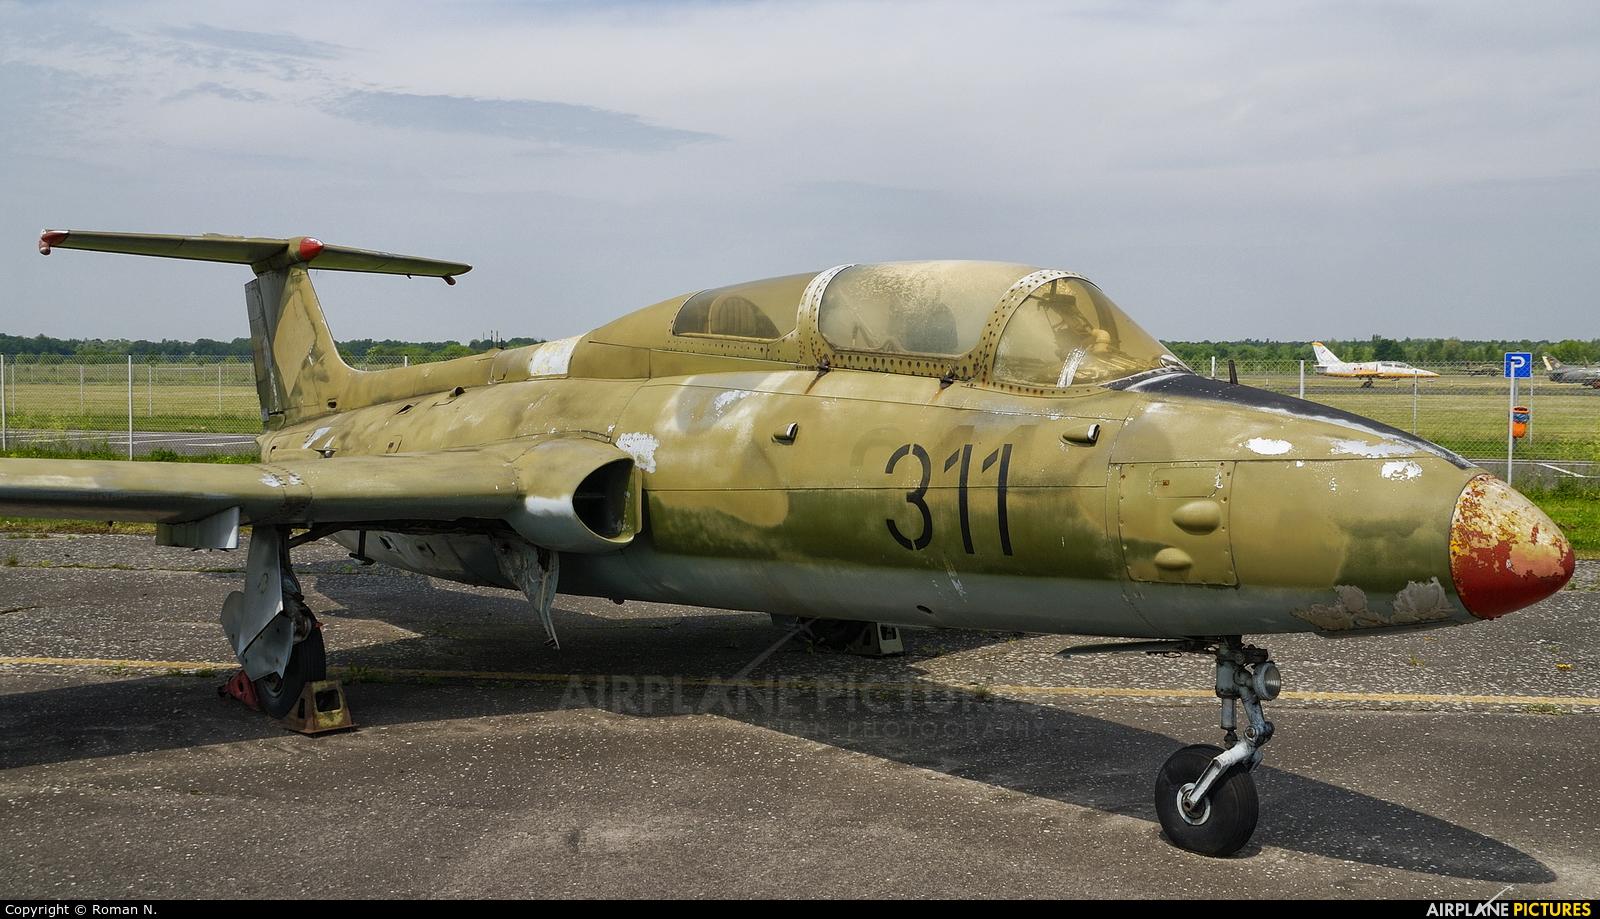 Germany - Democratic Republic Air Force 311 aircraft at Berlin - Gatow